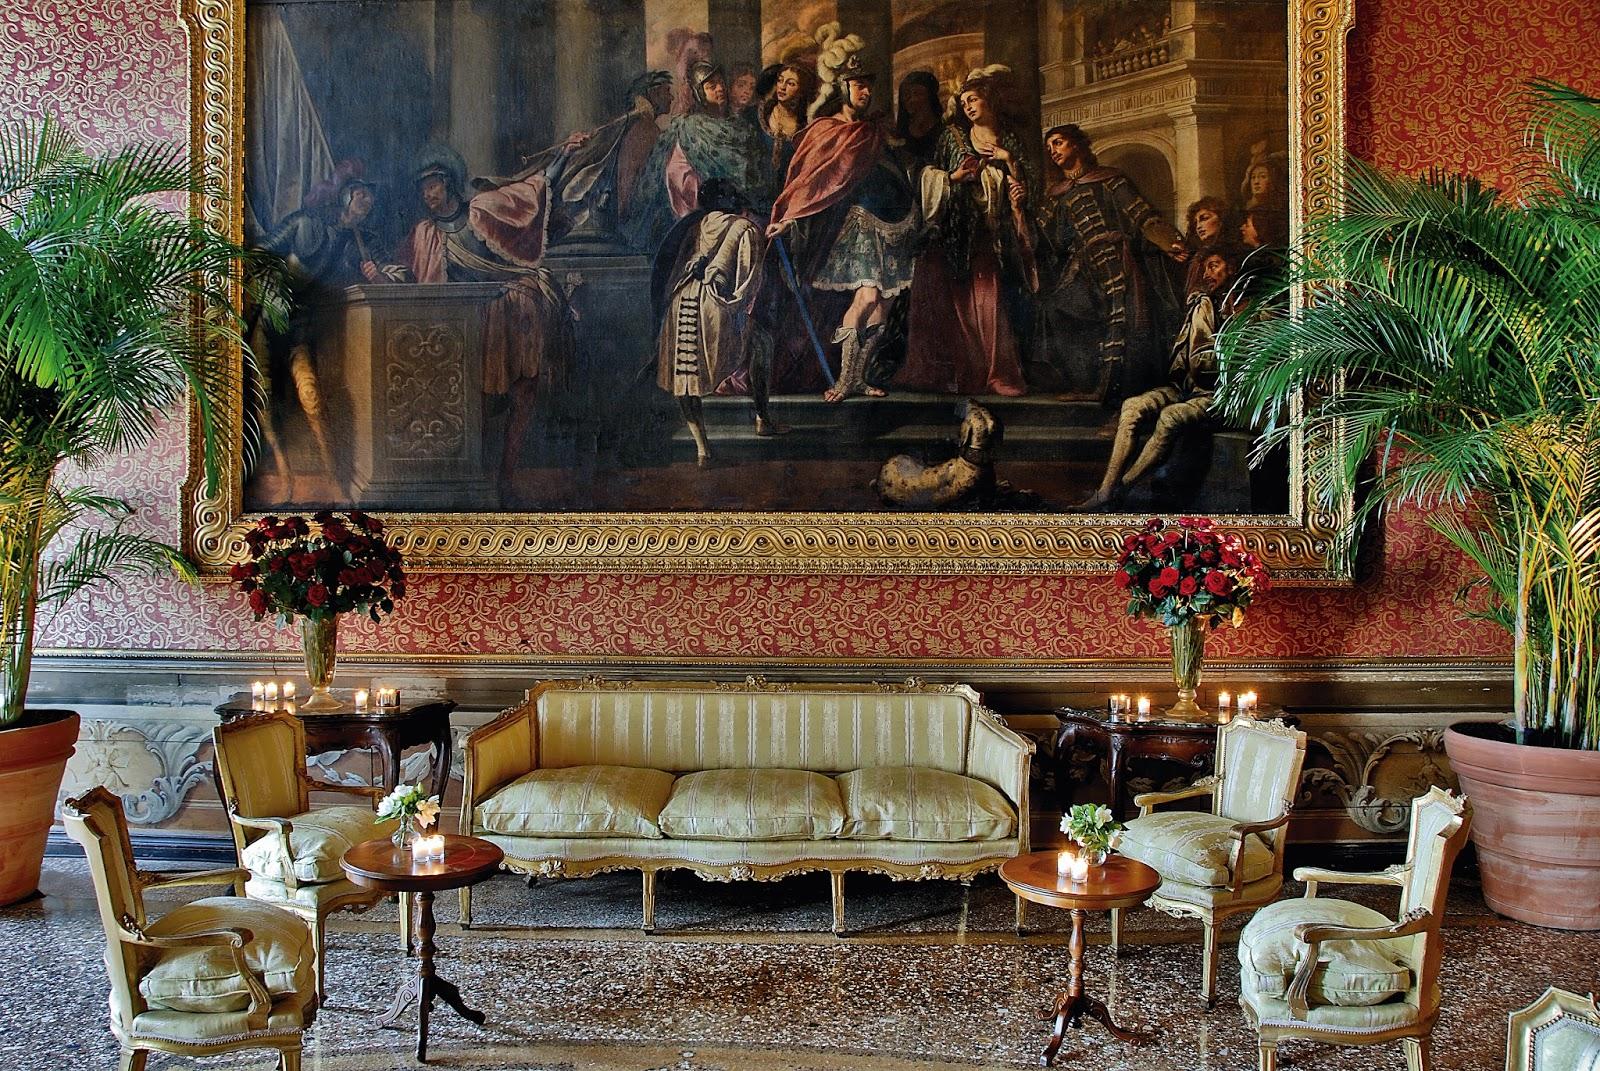 Bart boehlert 39 s beautiful things david monn 39 s joyful art for Bank ballroom with beautiful mural nyc